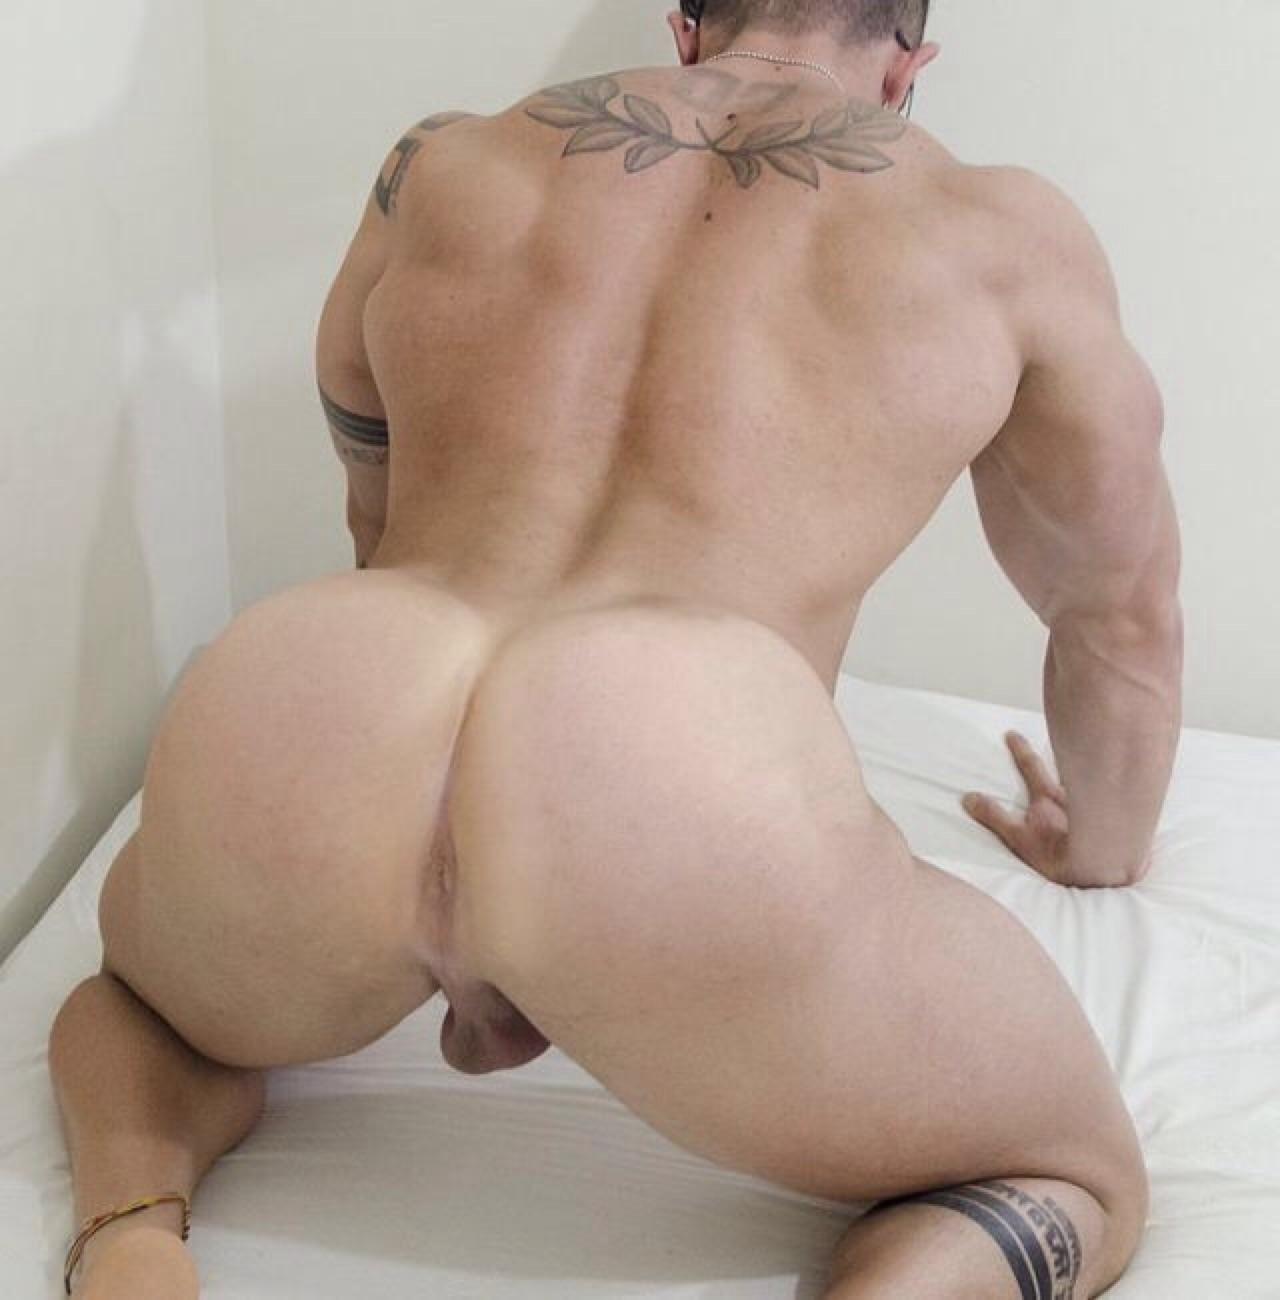 Gay Andres Fratmen Desnudo